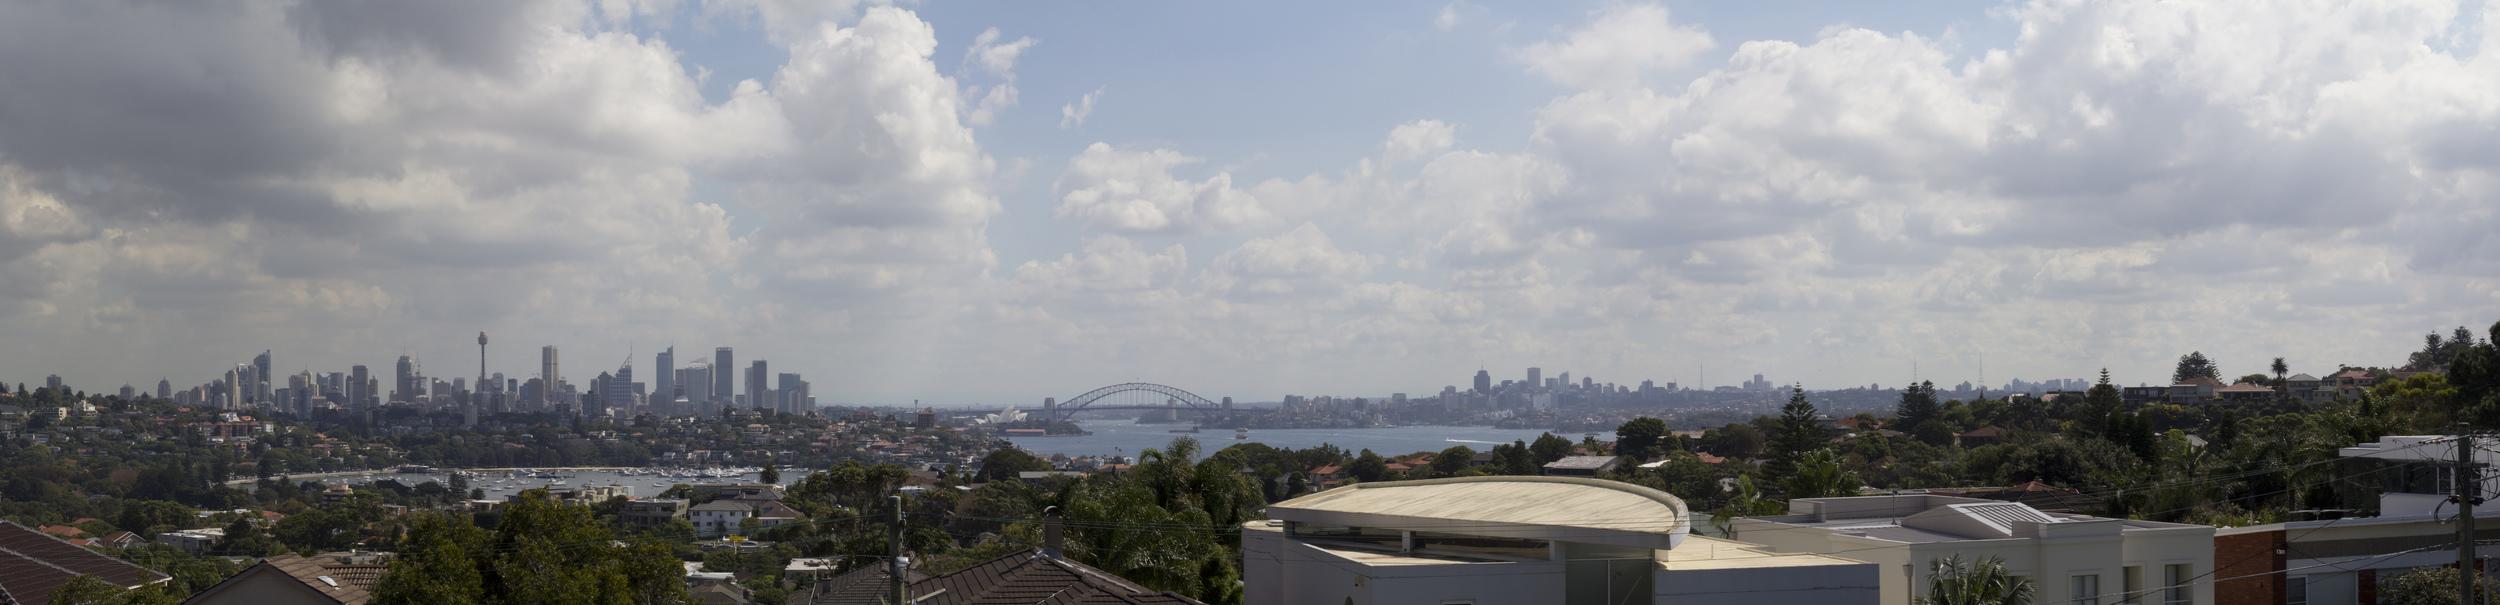 Sydney_City Spread Lookout Overview 2 Panarama 2.jpg